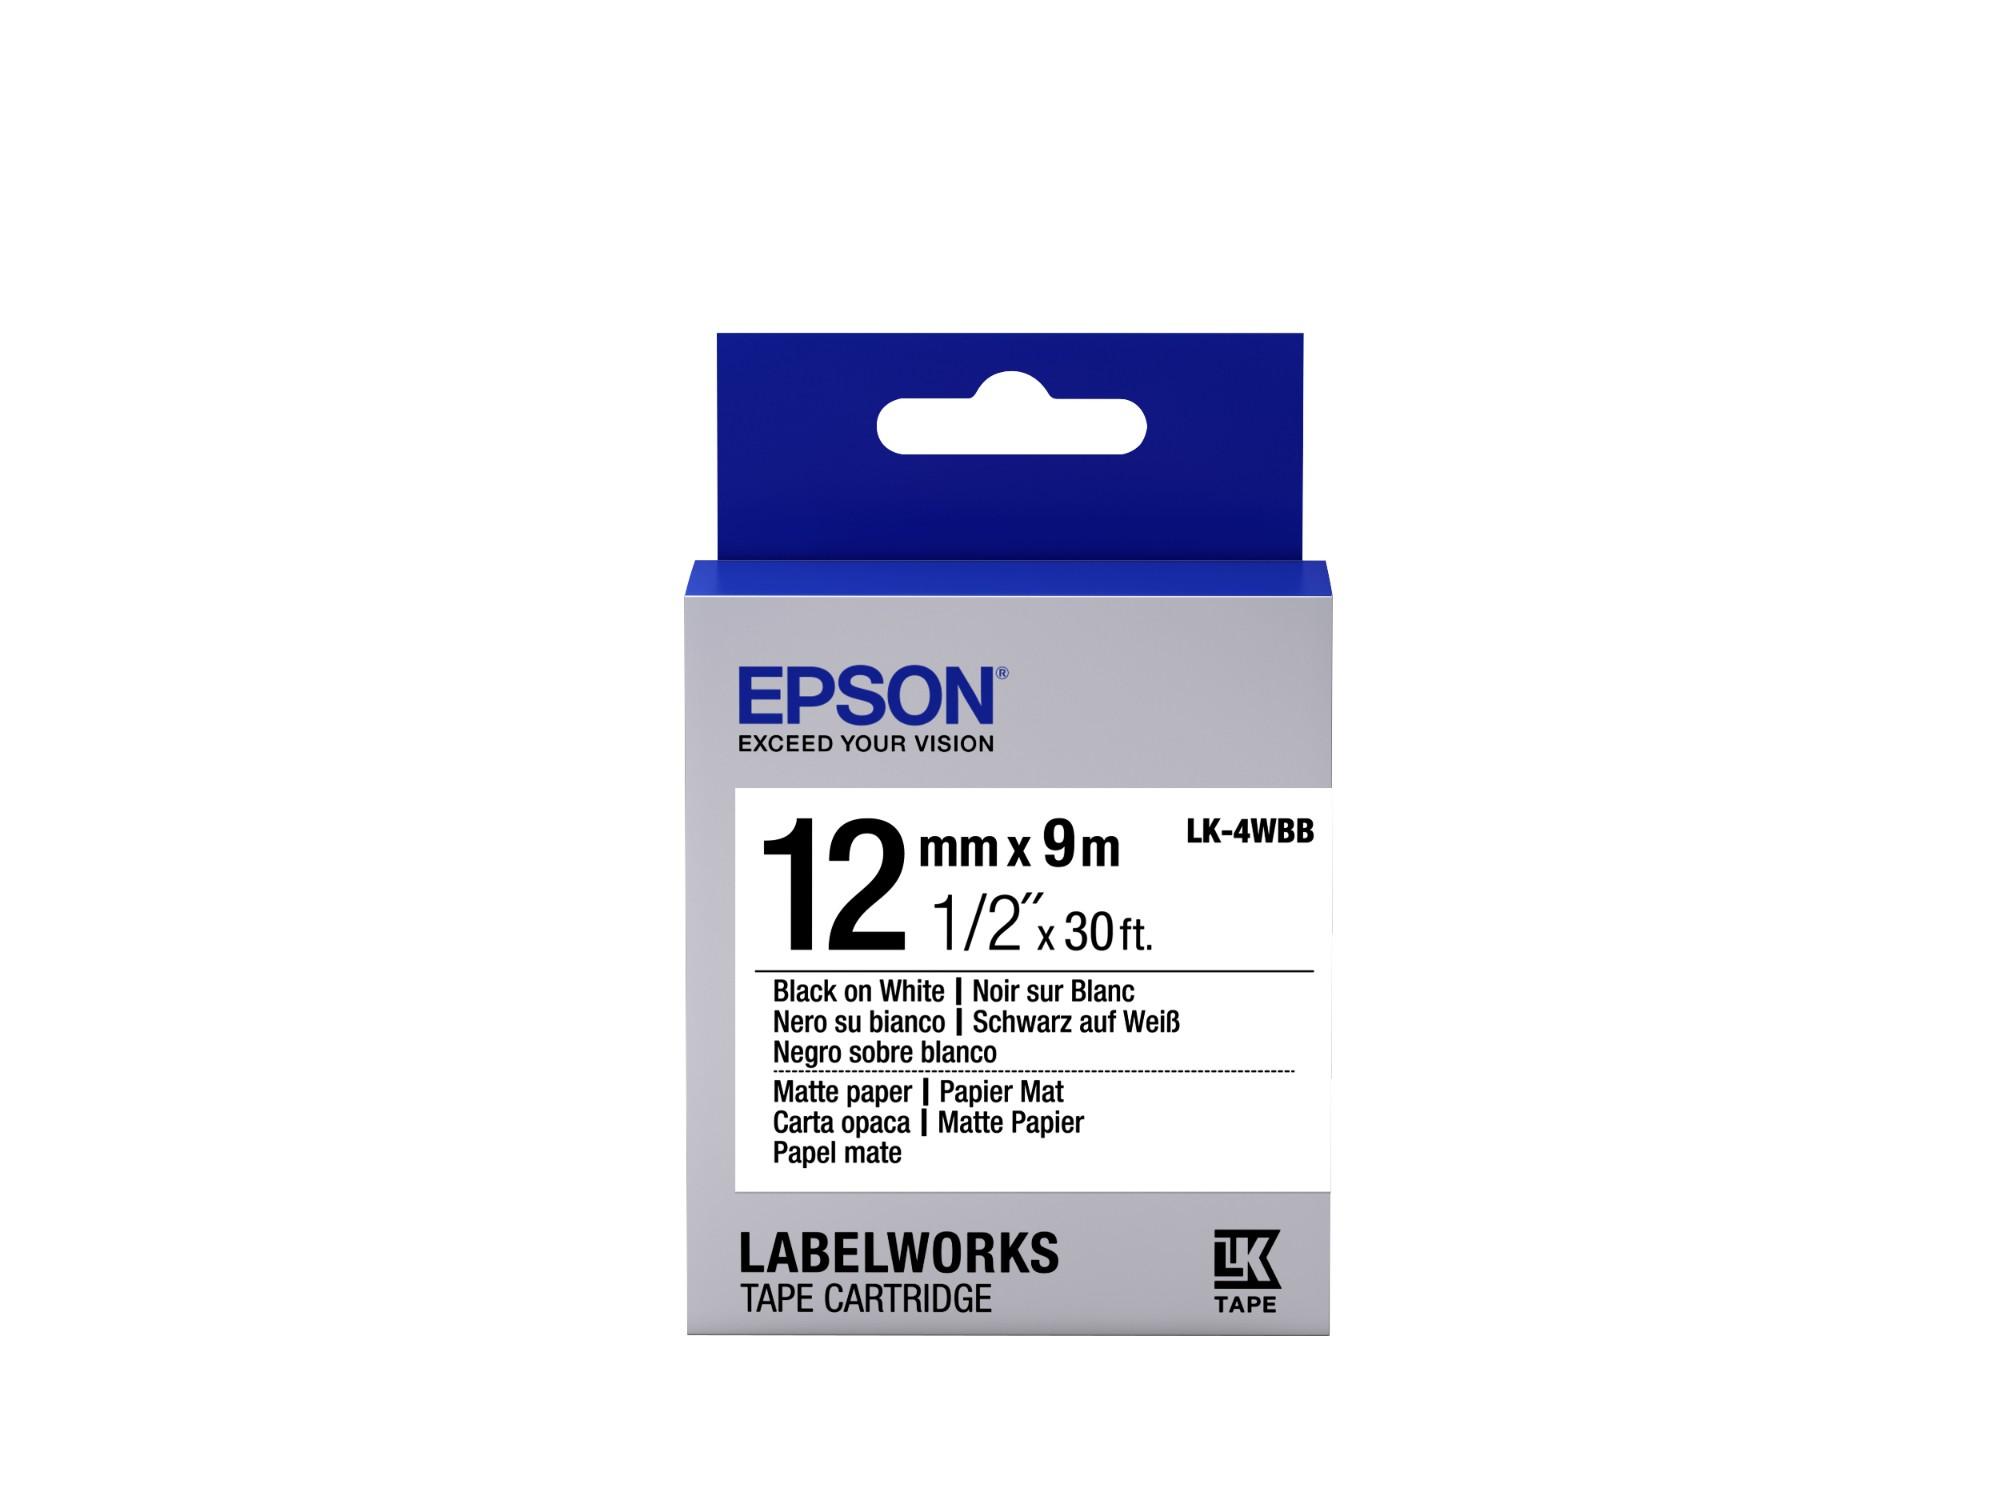 Epson C53S654023 (LK-4WBB) DirectLabel-etikettes, 12mm x 9m